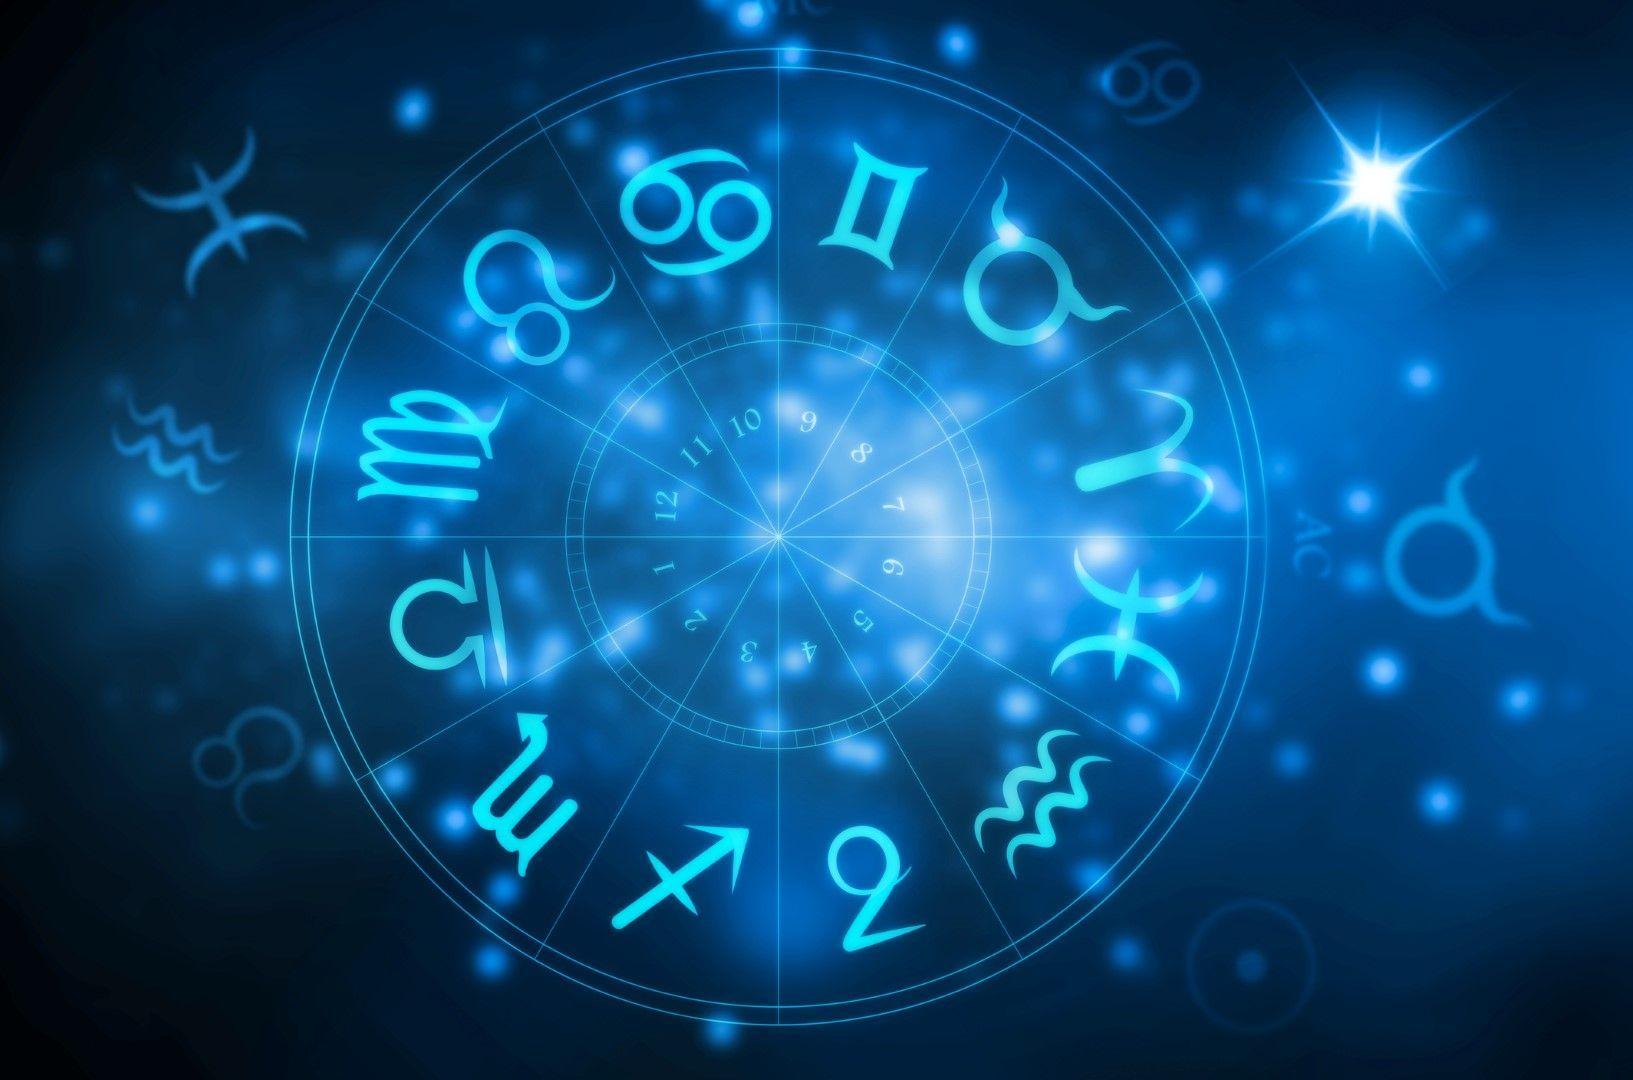 Container Torino Oroscopo Astrologia Ascendente